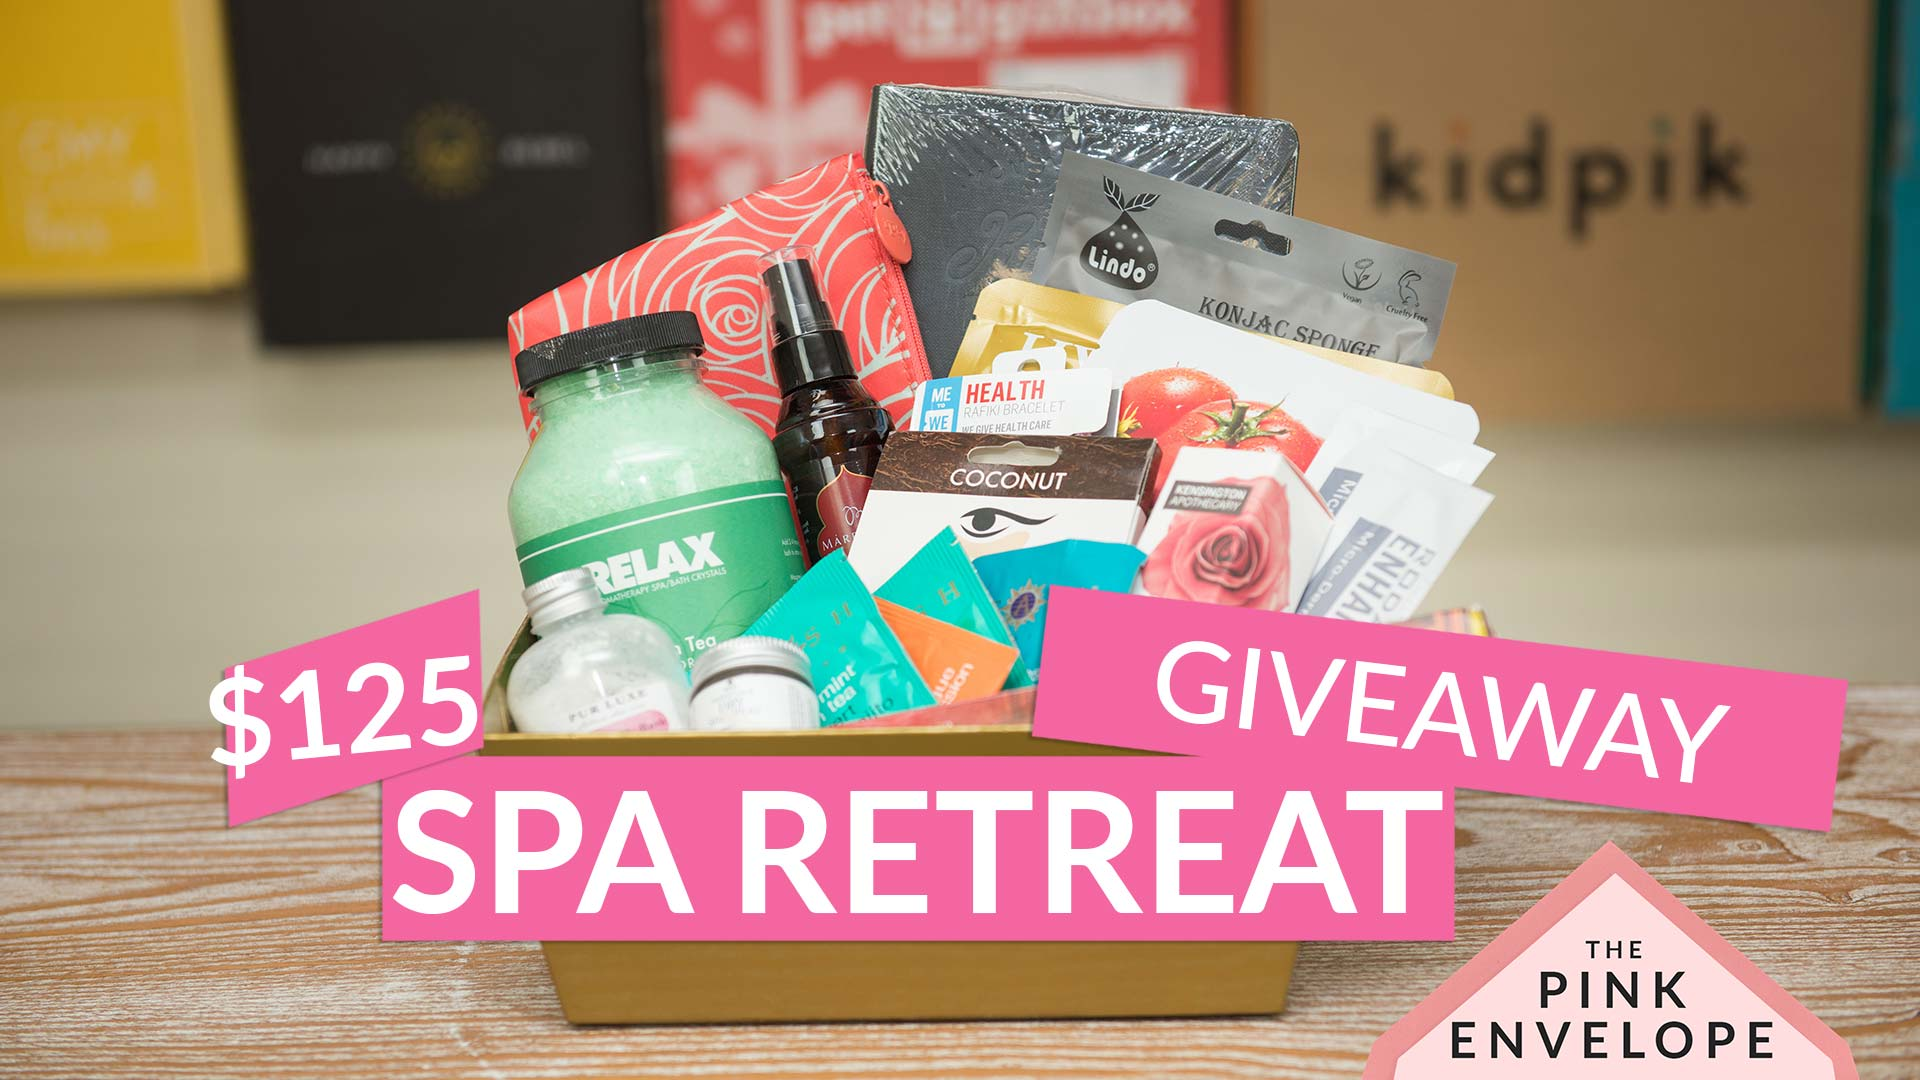 Spa Retreat Gift Basket Giveaway – $125 Value